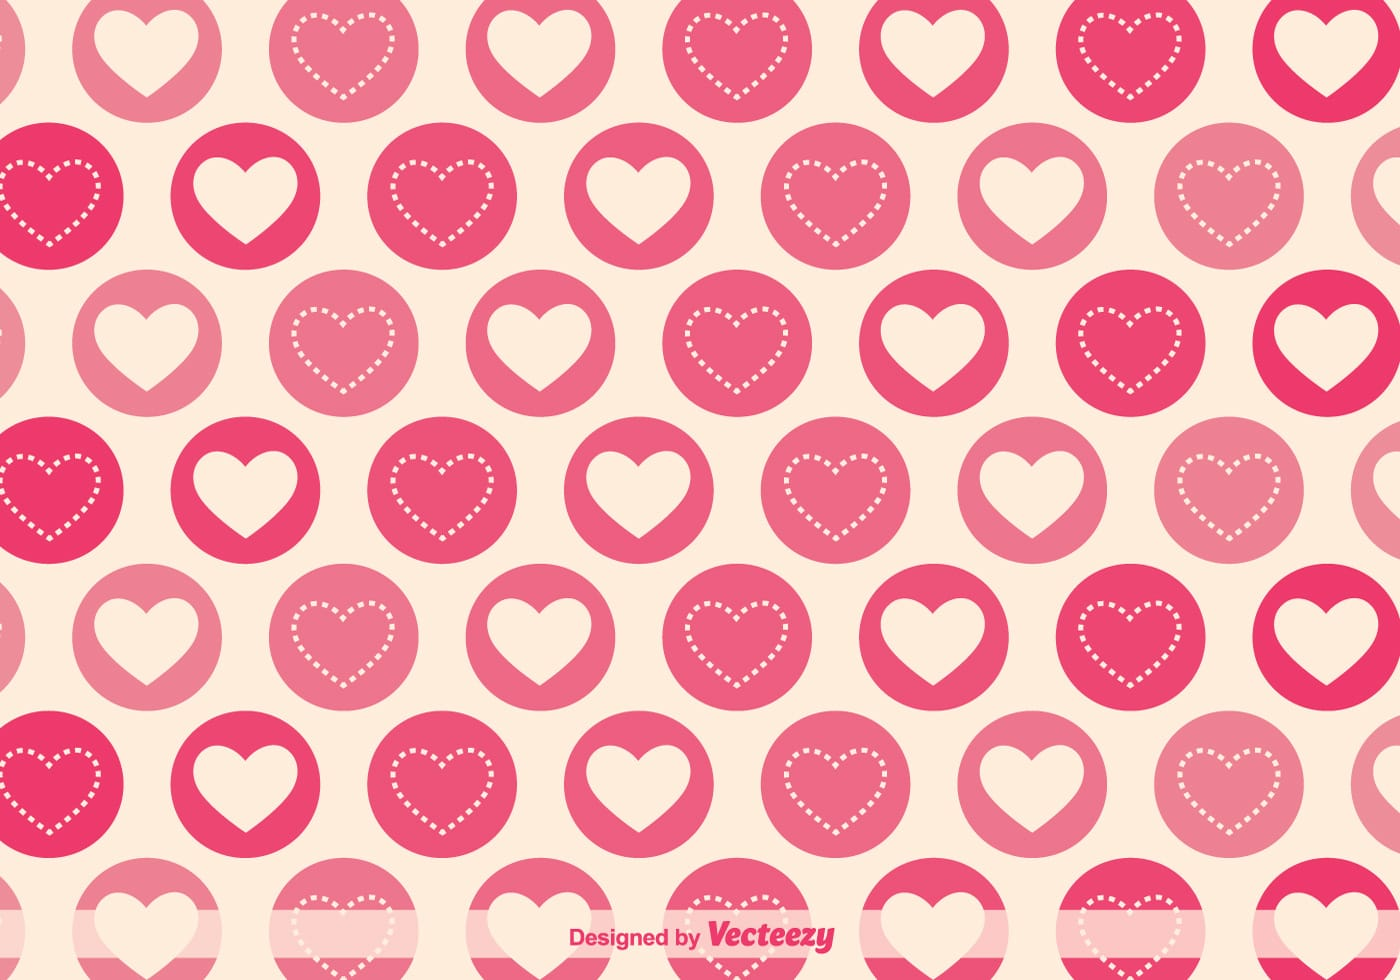 Geometric Pattern Free Vector Art - (10951 Free Downloads)